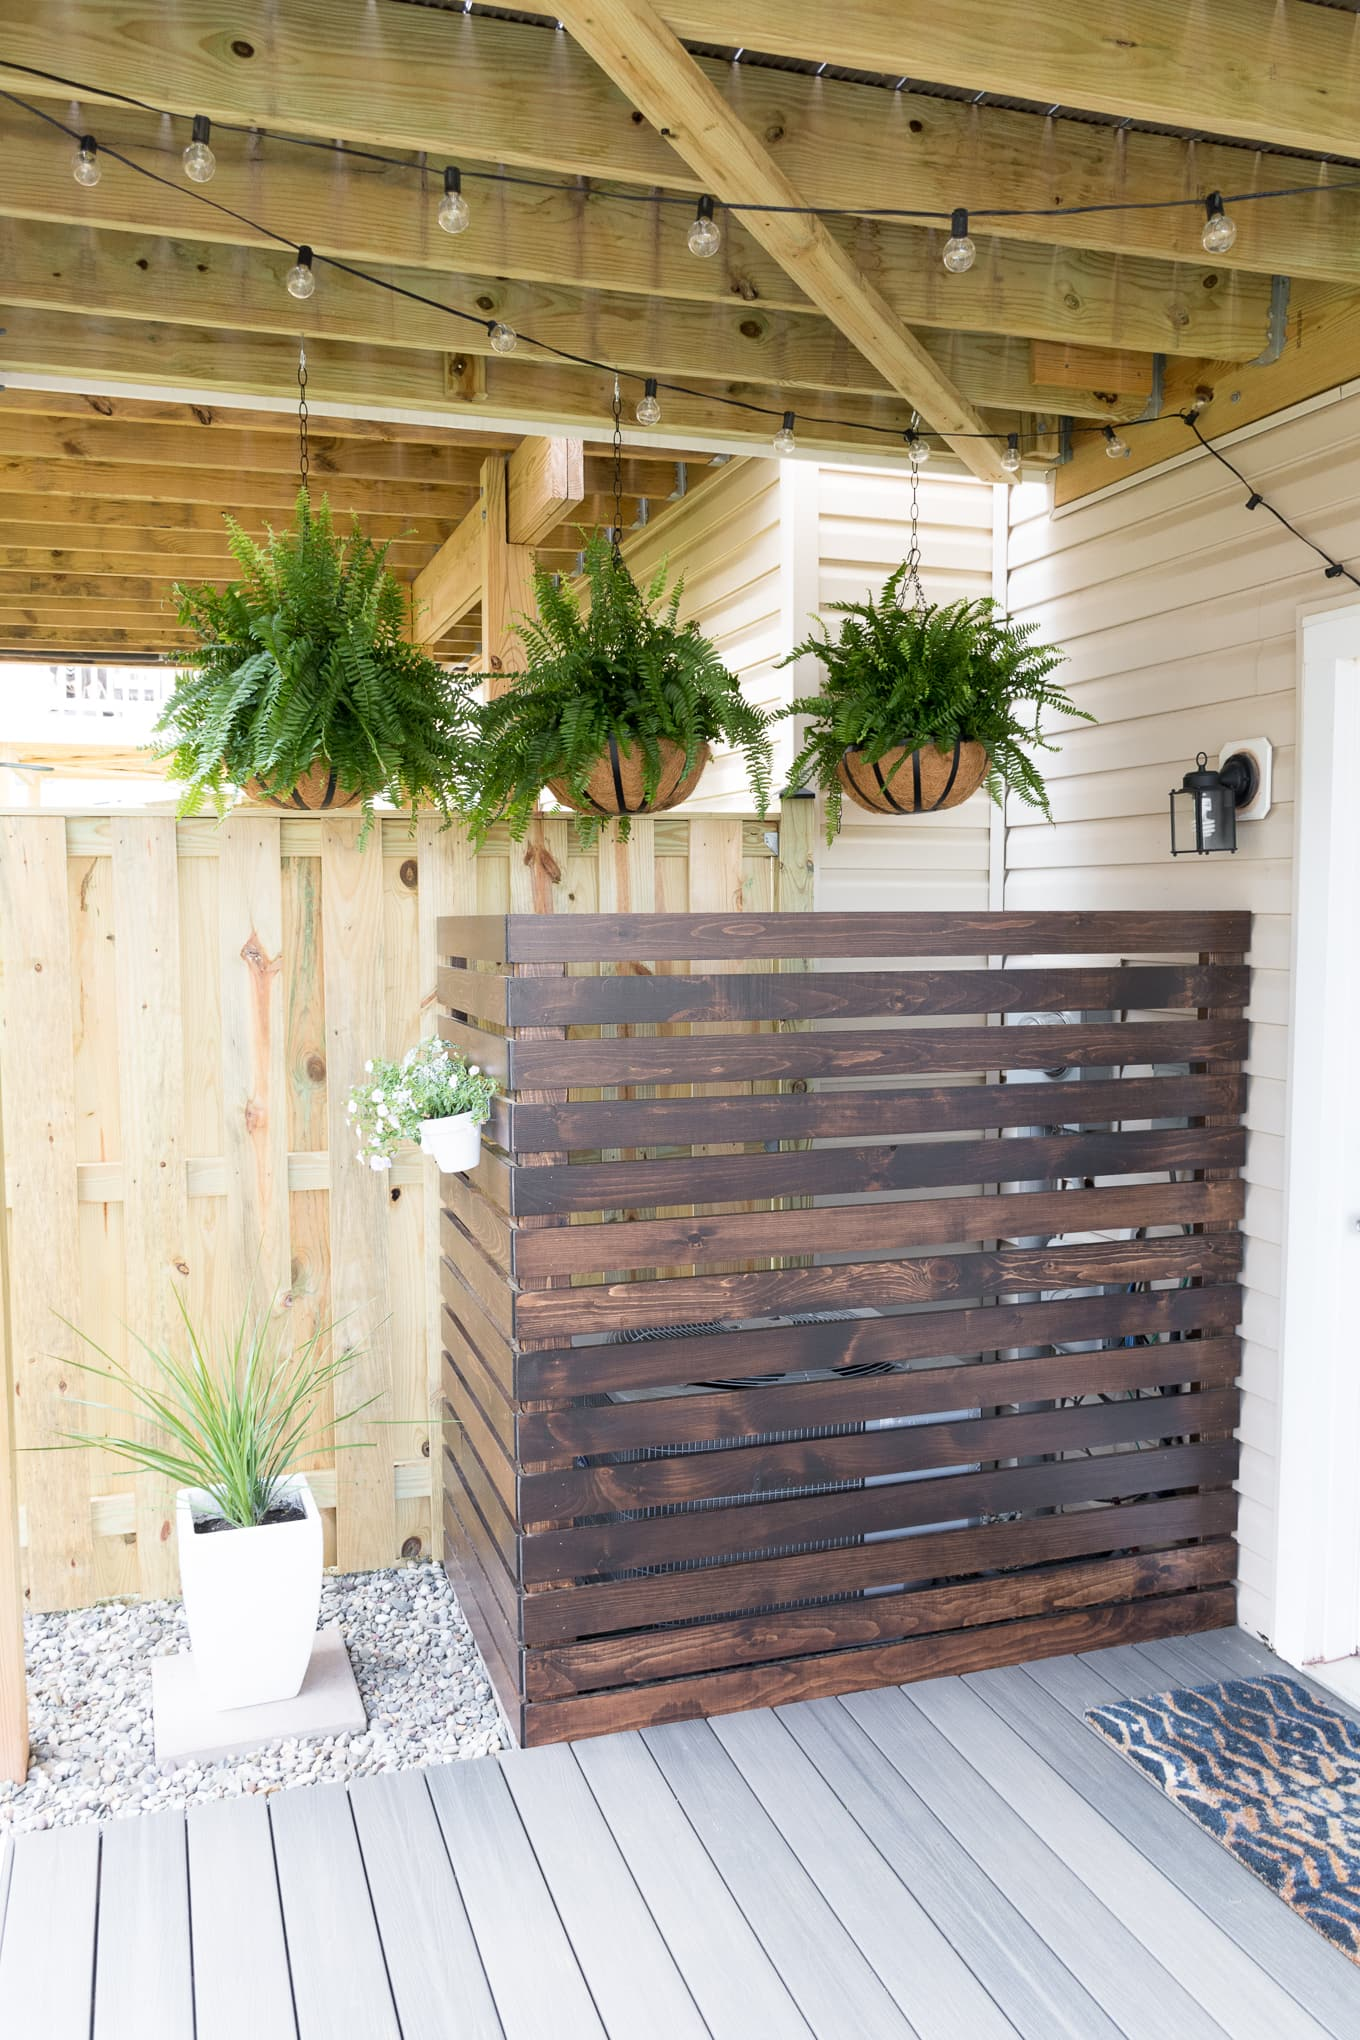 Modern design ideas for a small backyard // My Tiny Backyard // by Brittany Goldwyn #buildplans #diy #kregtool #pocketholes #woodworking